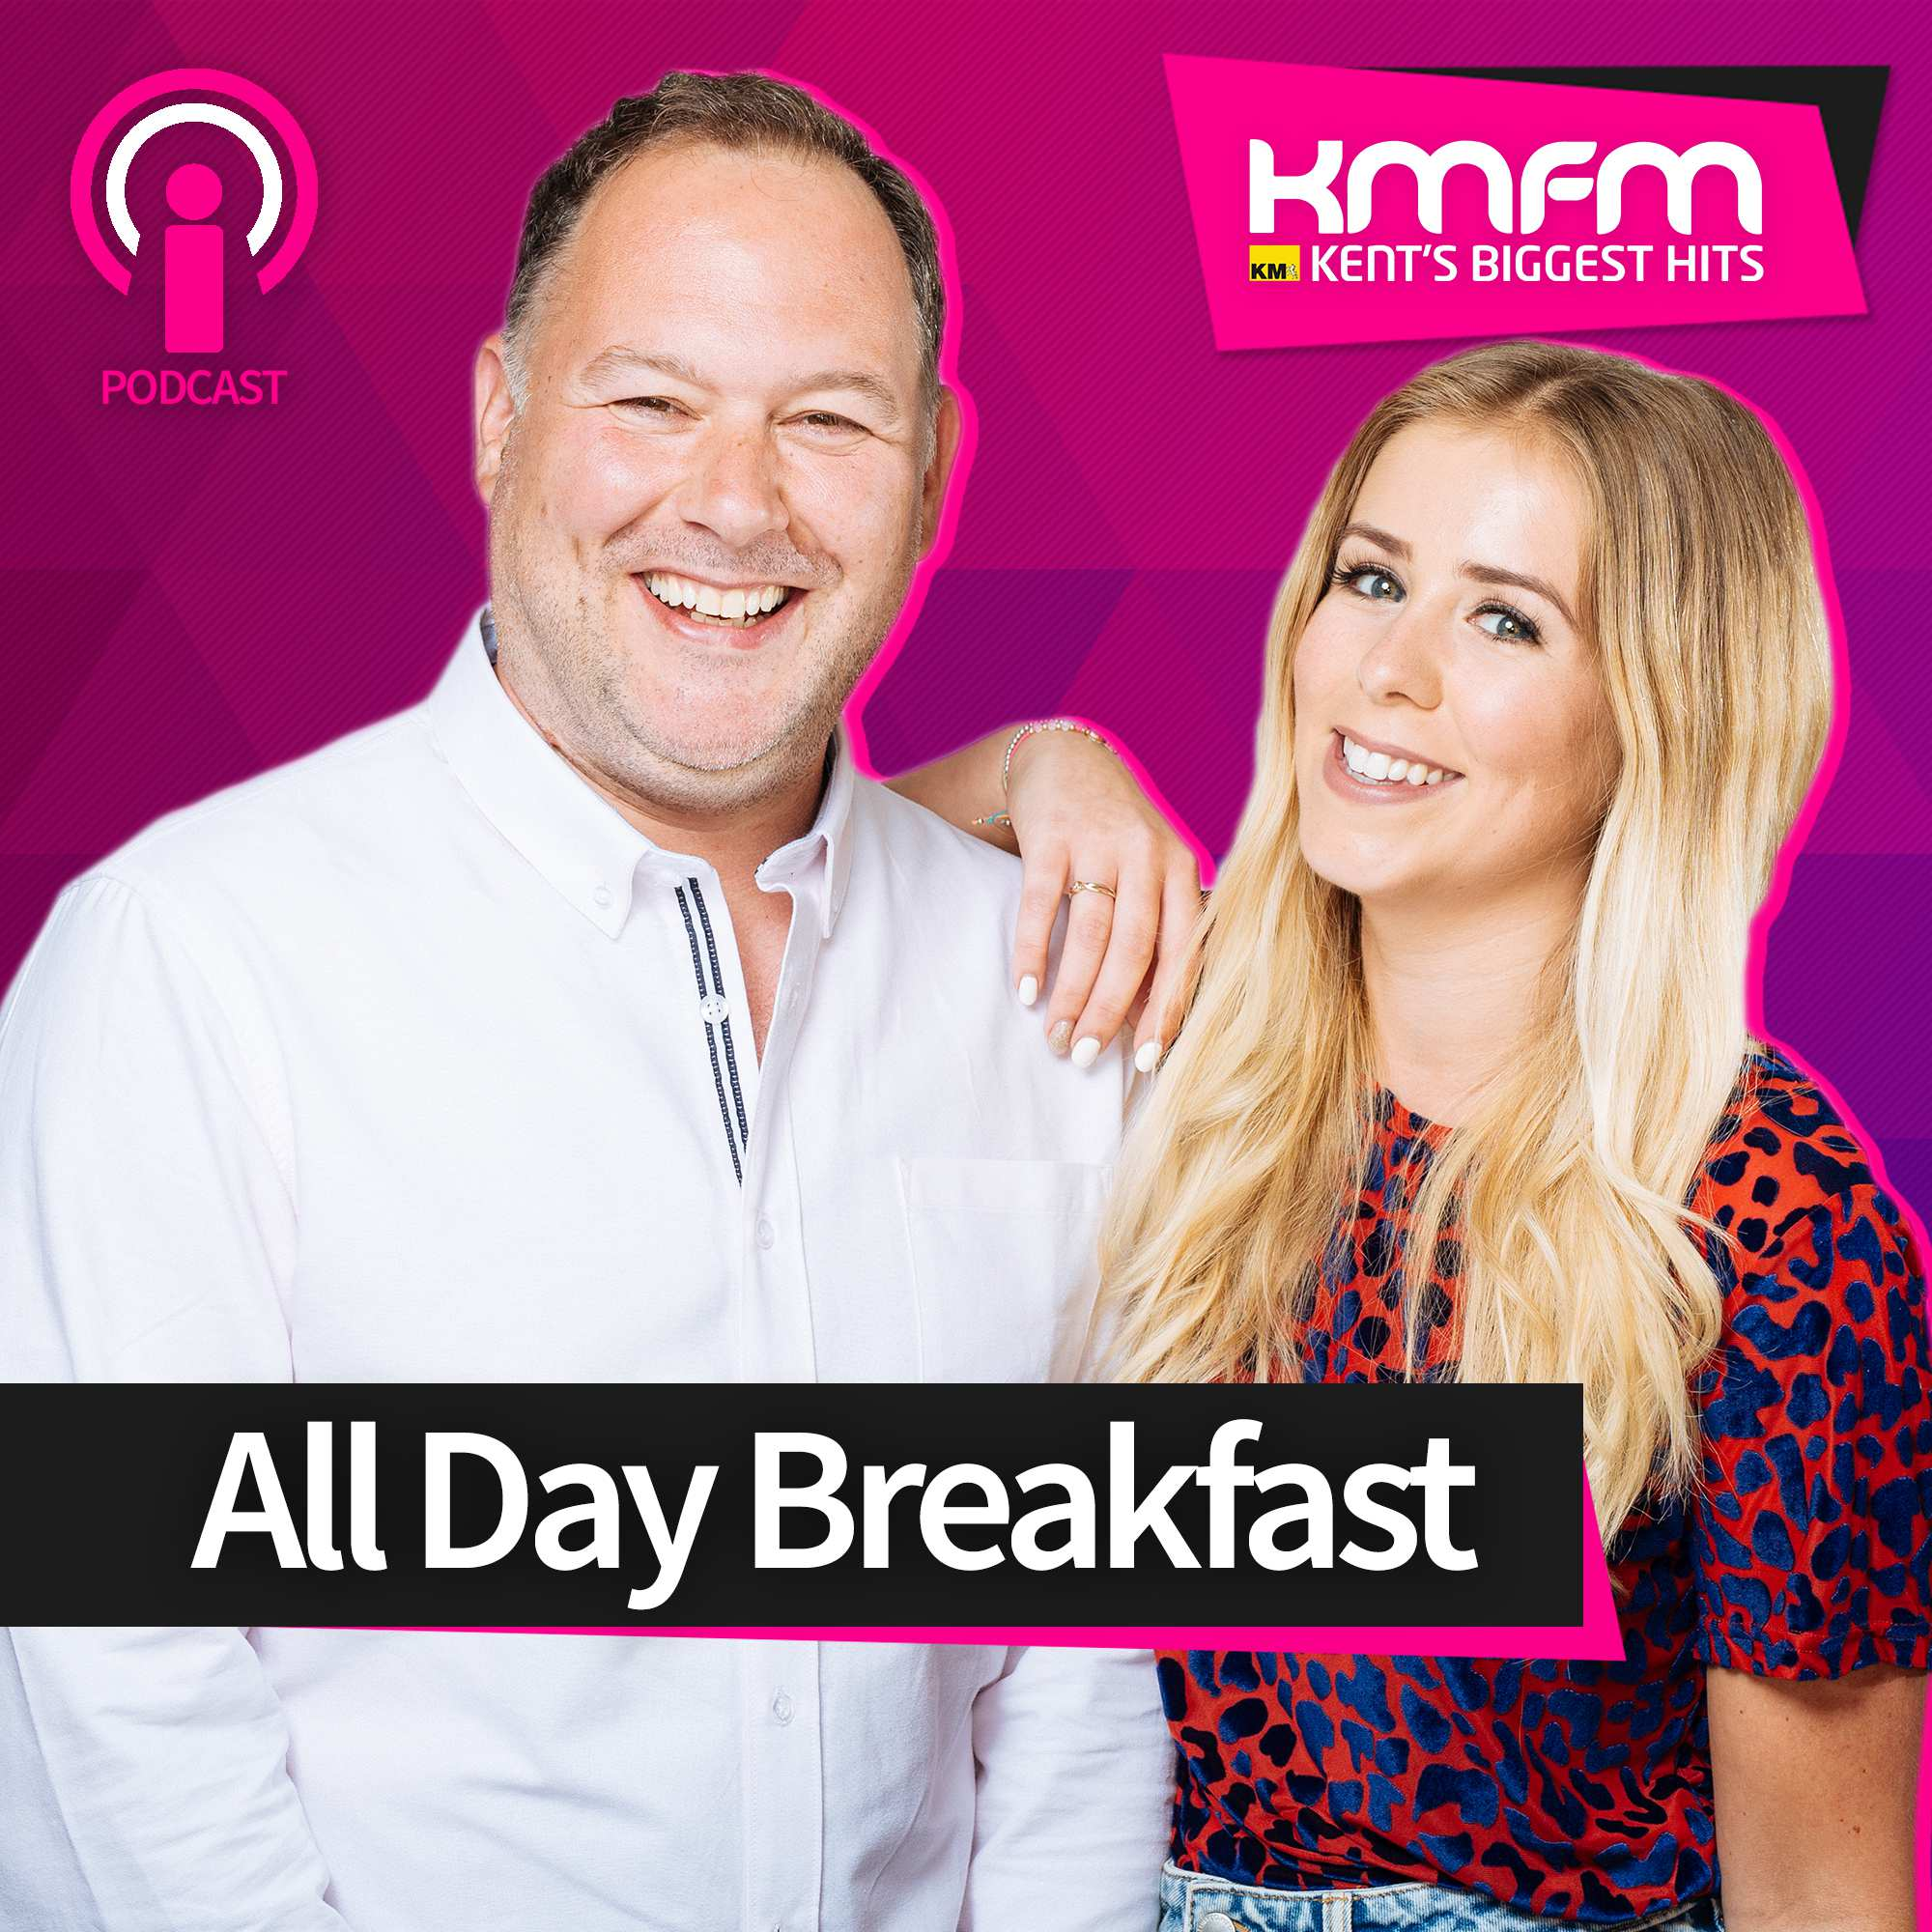 kmfm All Day Breakfast